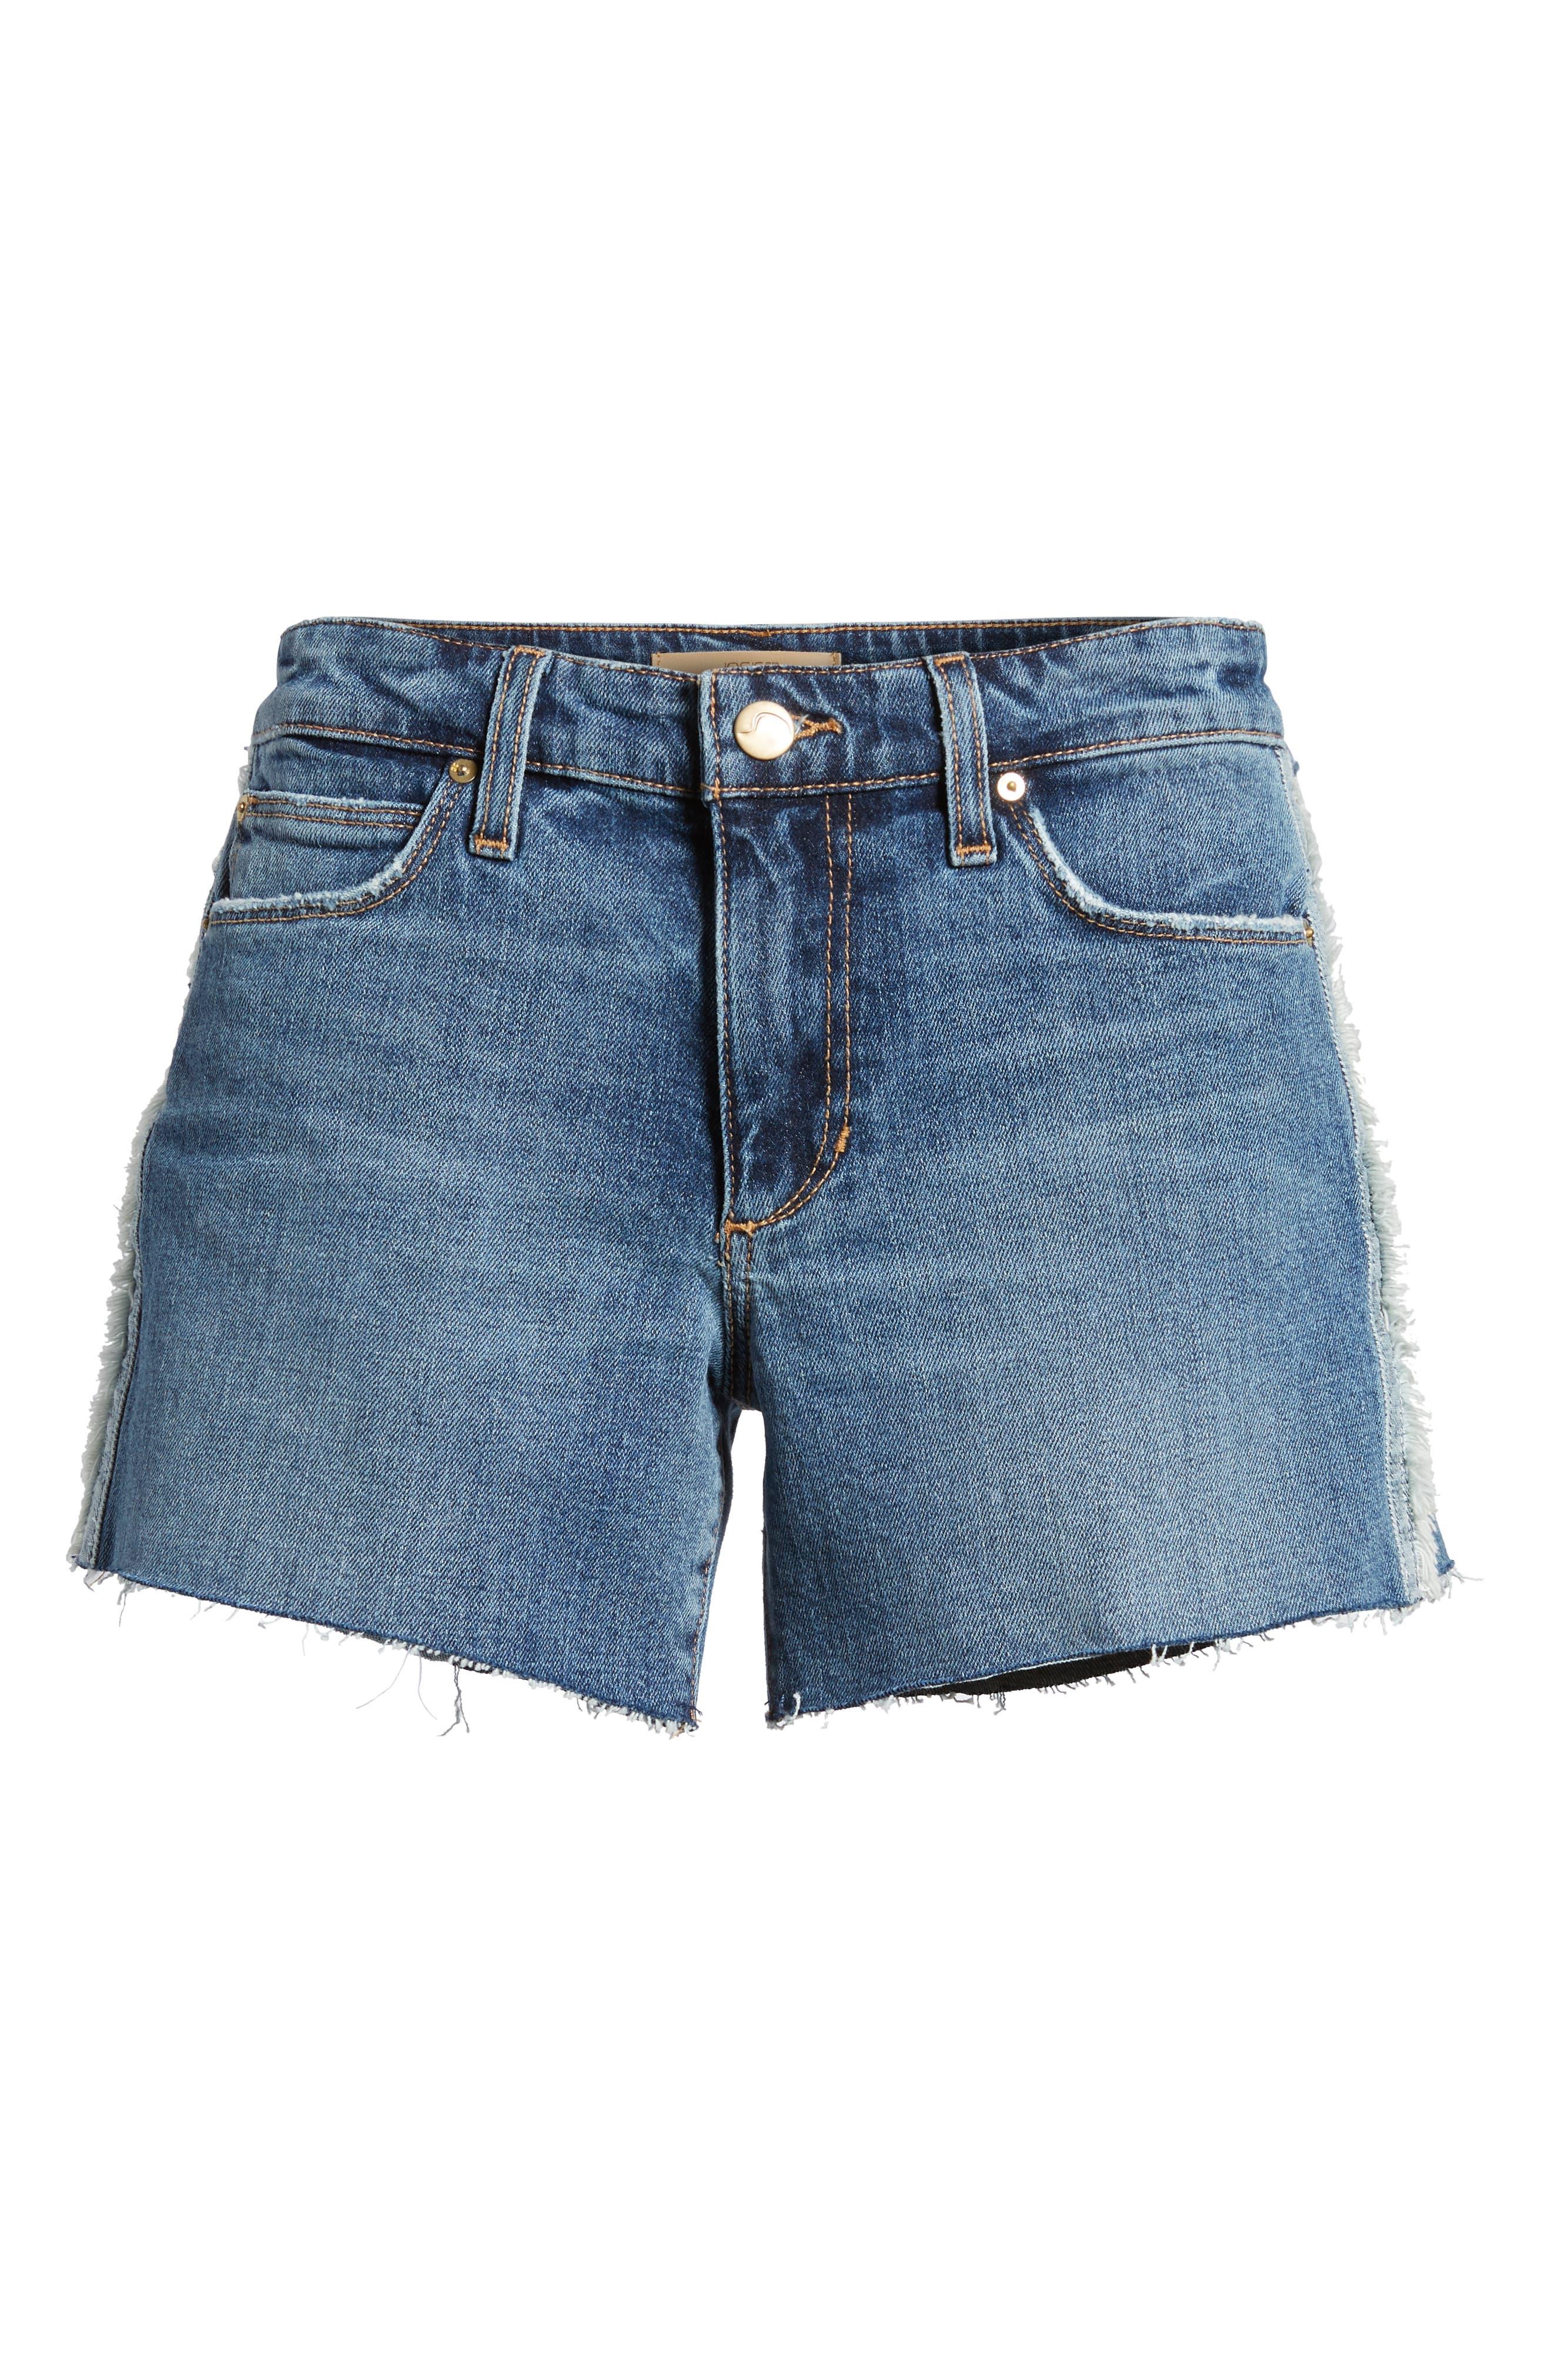 Ozzie Side Stripe Cutoff Shorts,                             Alternate thumbnail 7, color,                             Madera